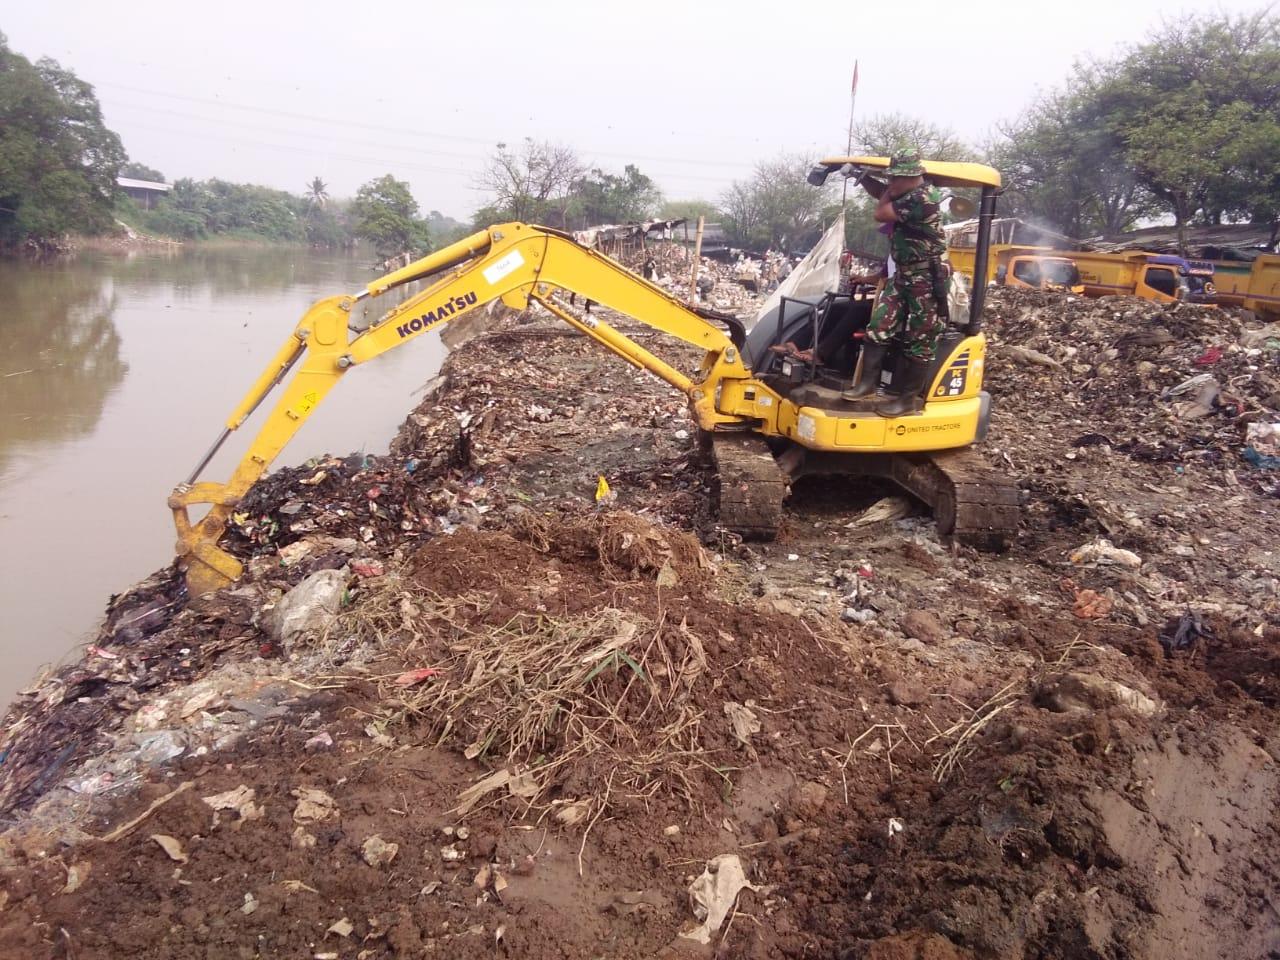 Sampah di Bantaran Sungai Cisadane, Kecamatan Teluk Naga, Kabupaten Tangerang di bersihkan menggunakan alat berat beko dari Dinas Lingkungan Hidup dan Kebersihan (DLHK).